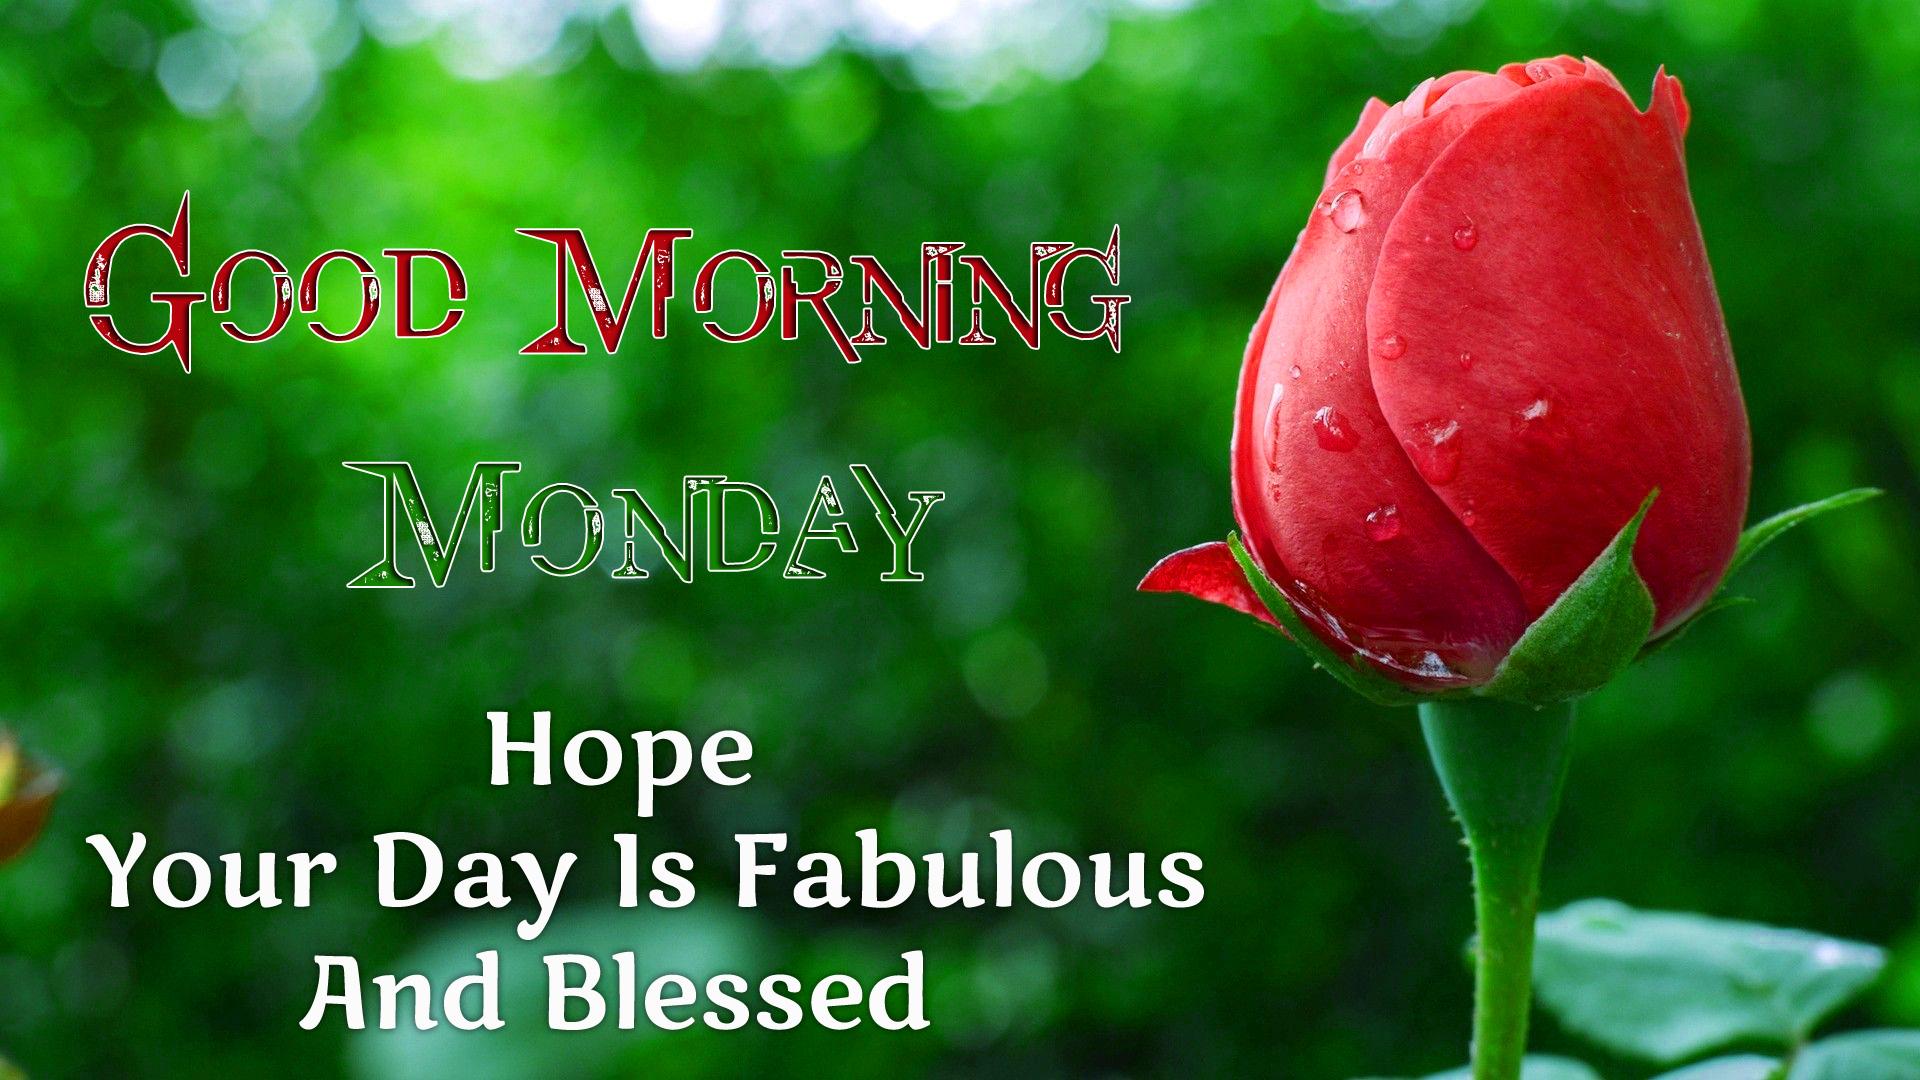 Monday Good Morning Wishes 1